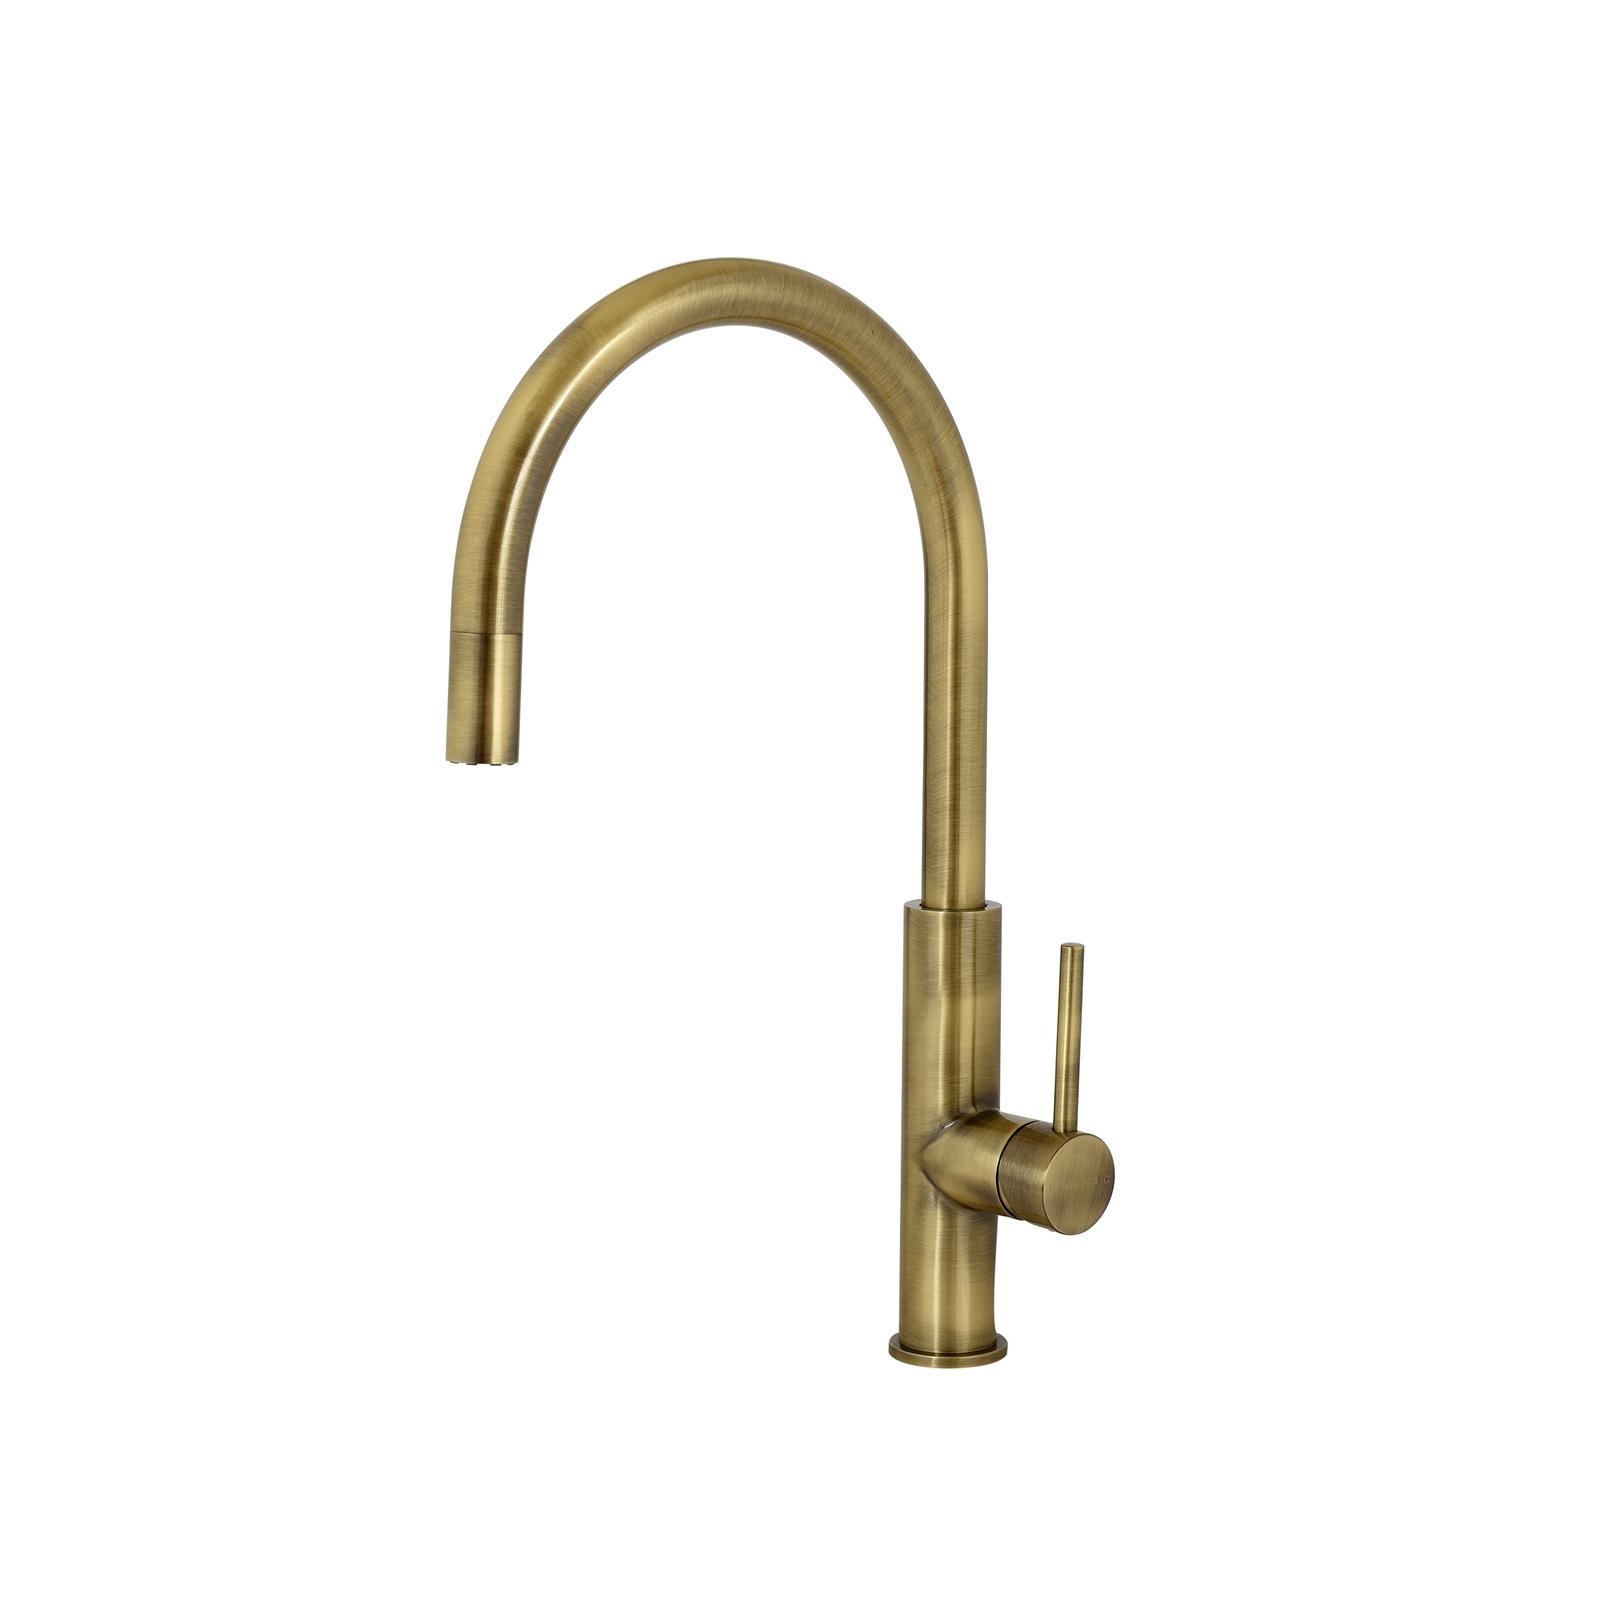 Aquatica Metalique Bronze Gooseneck Sink Mixer